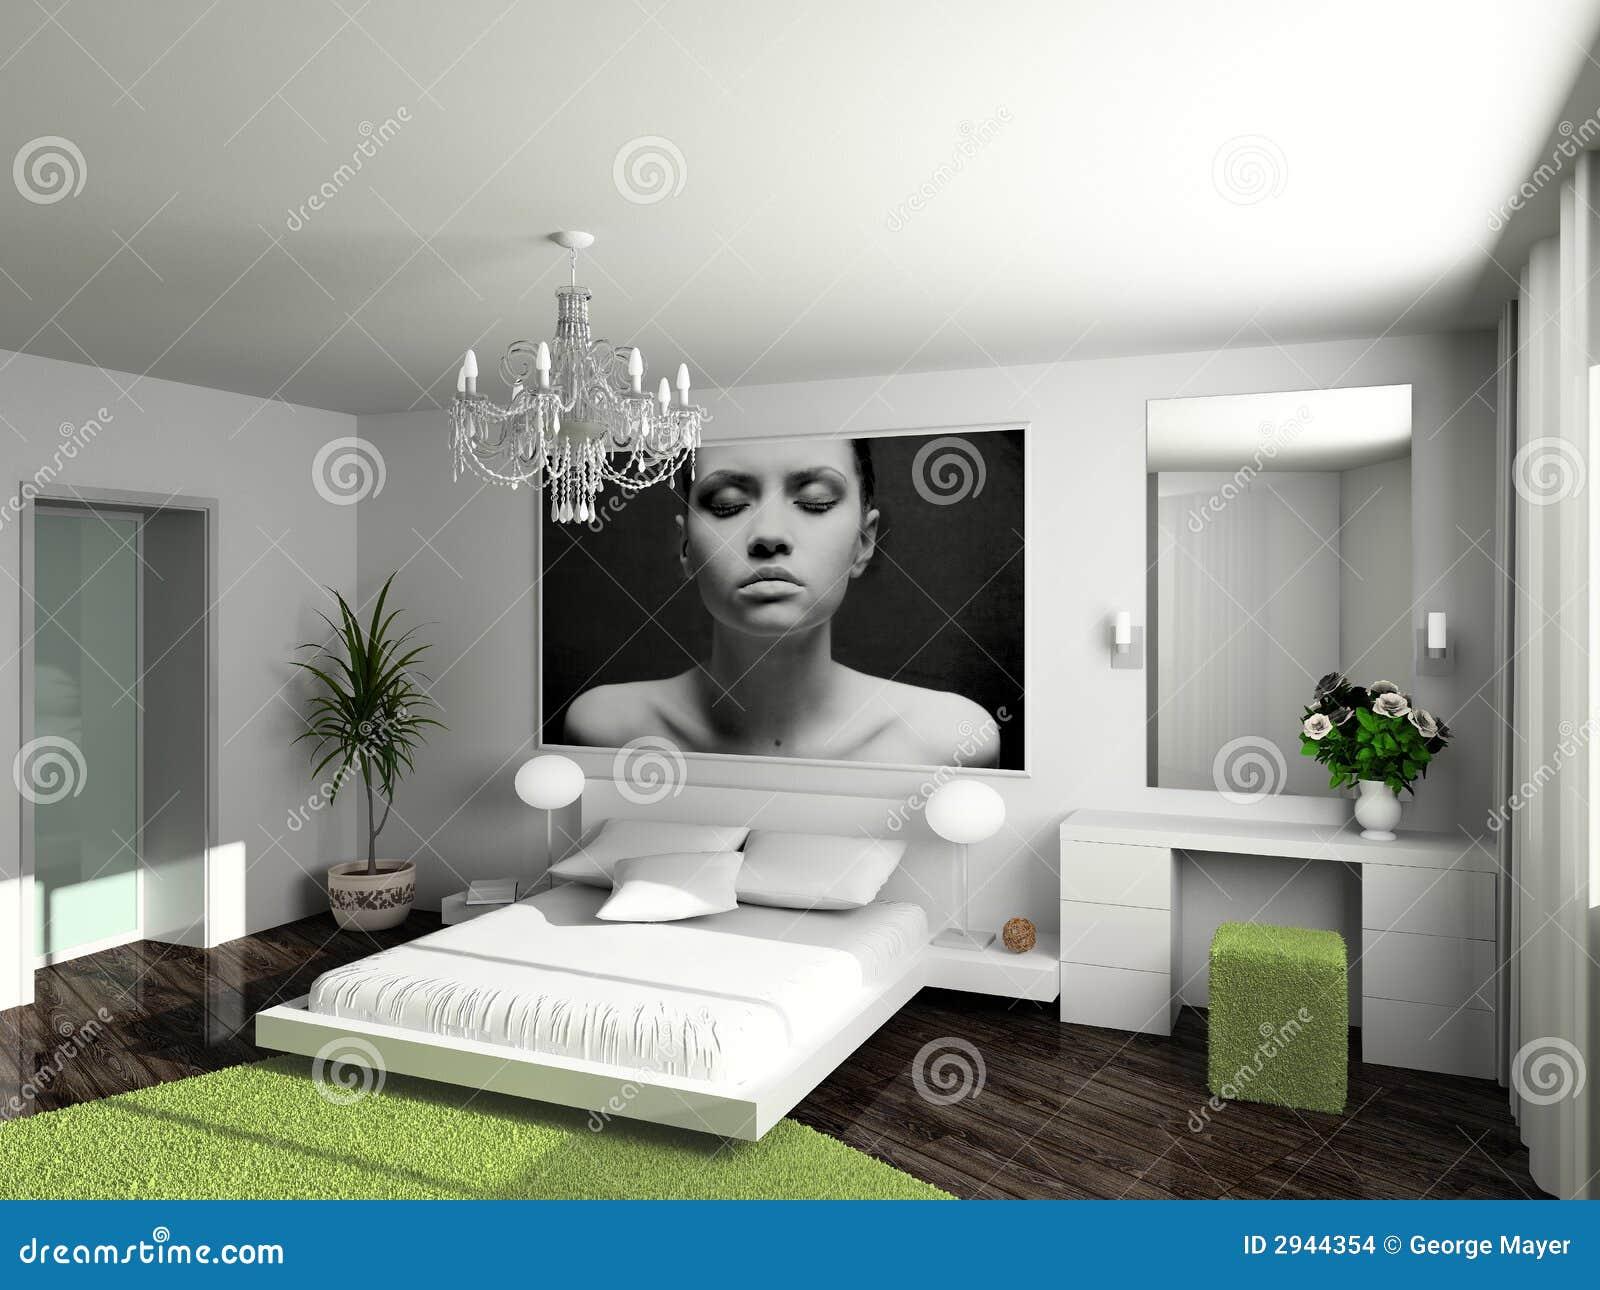 modern home interior stock images image 2944354 3d home design stock illustration image 59714426